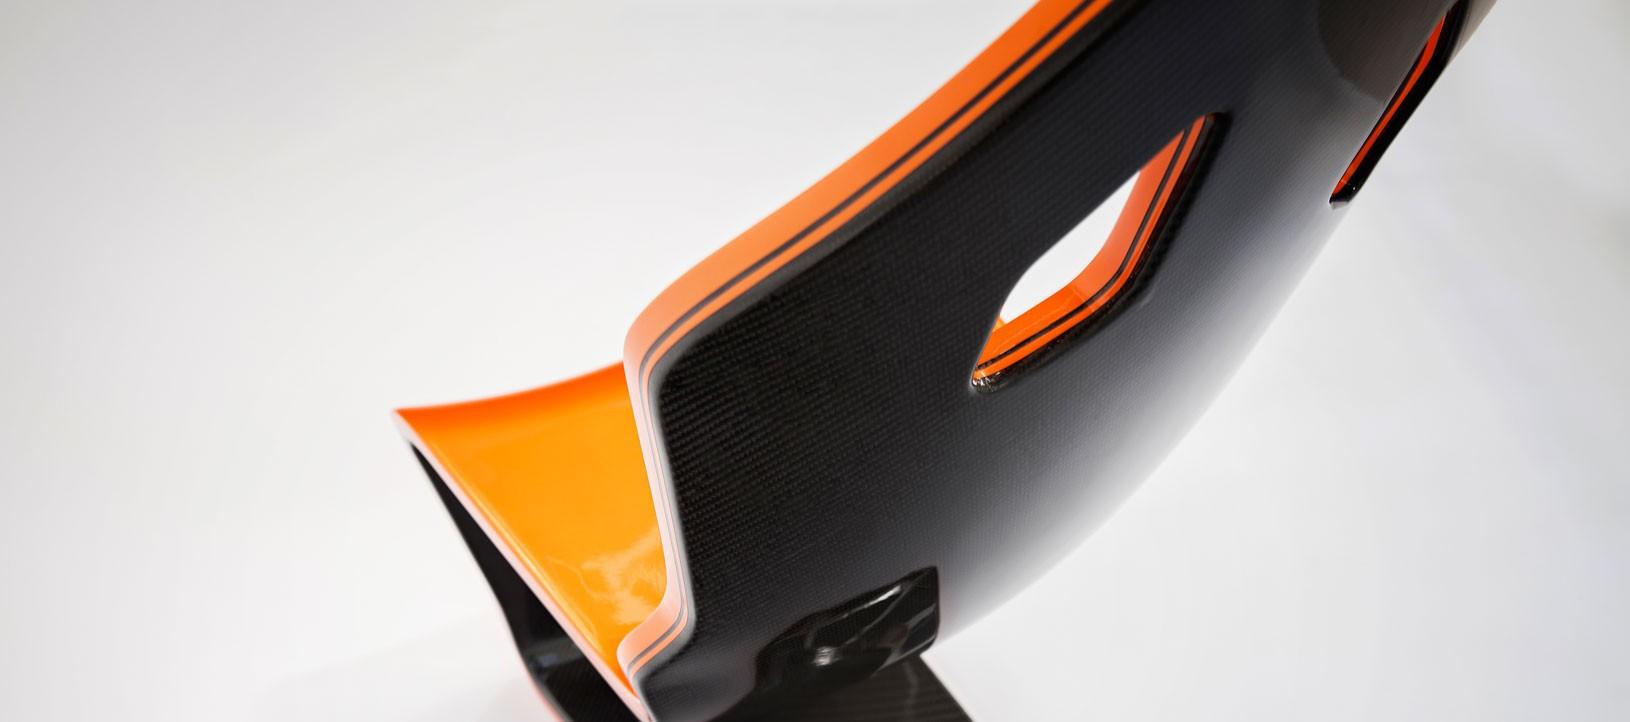 f1-carbon-fiber-lounge-chair-orange